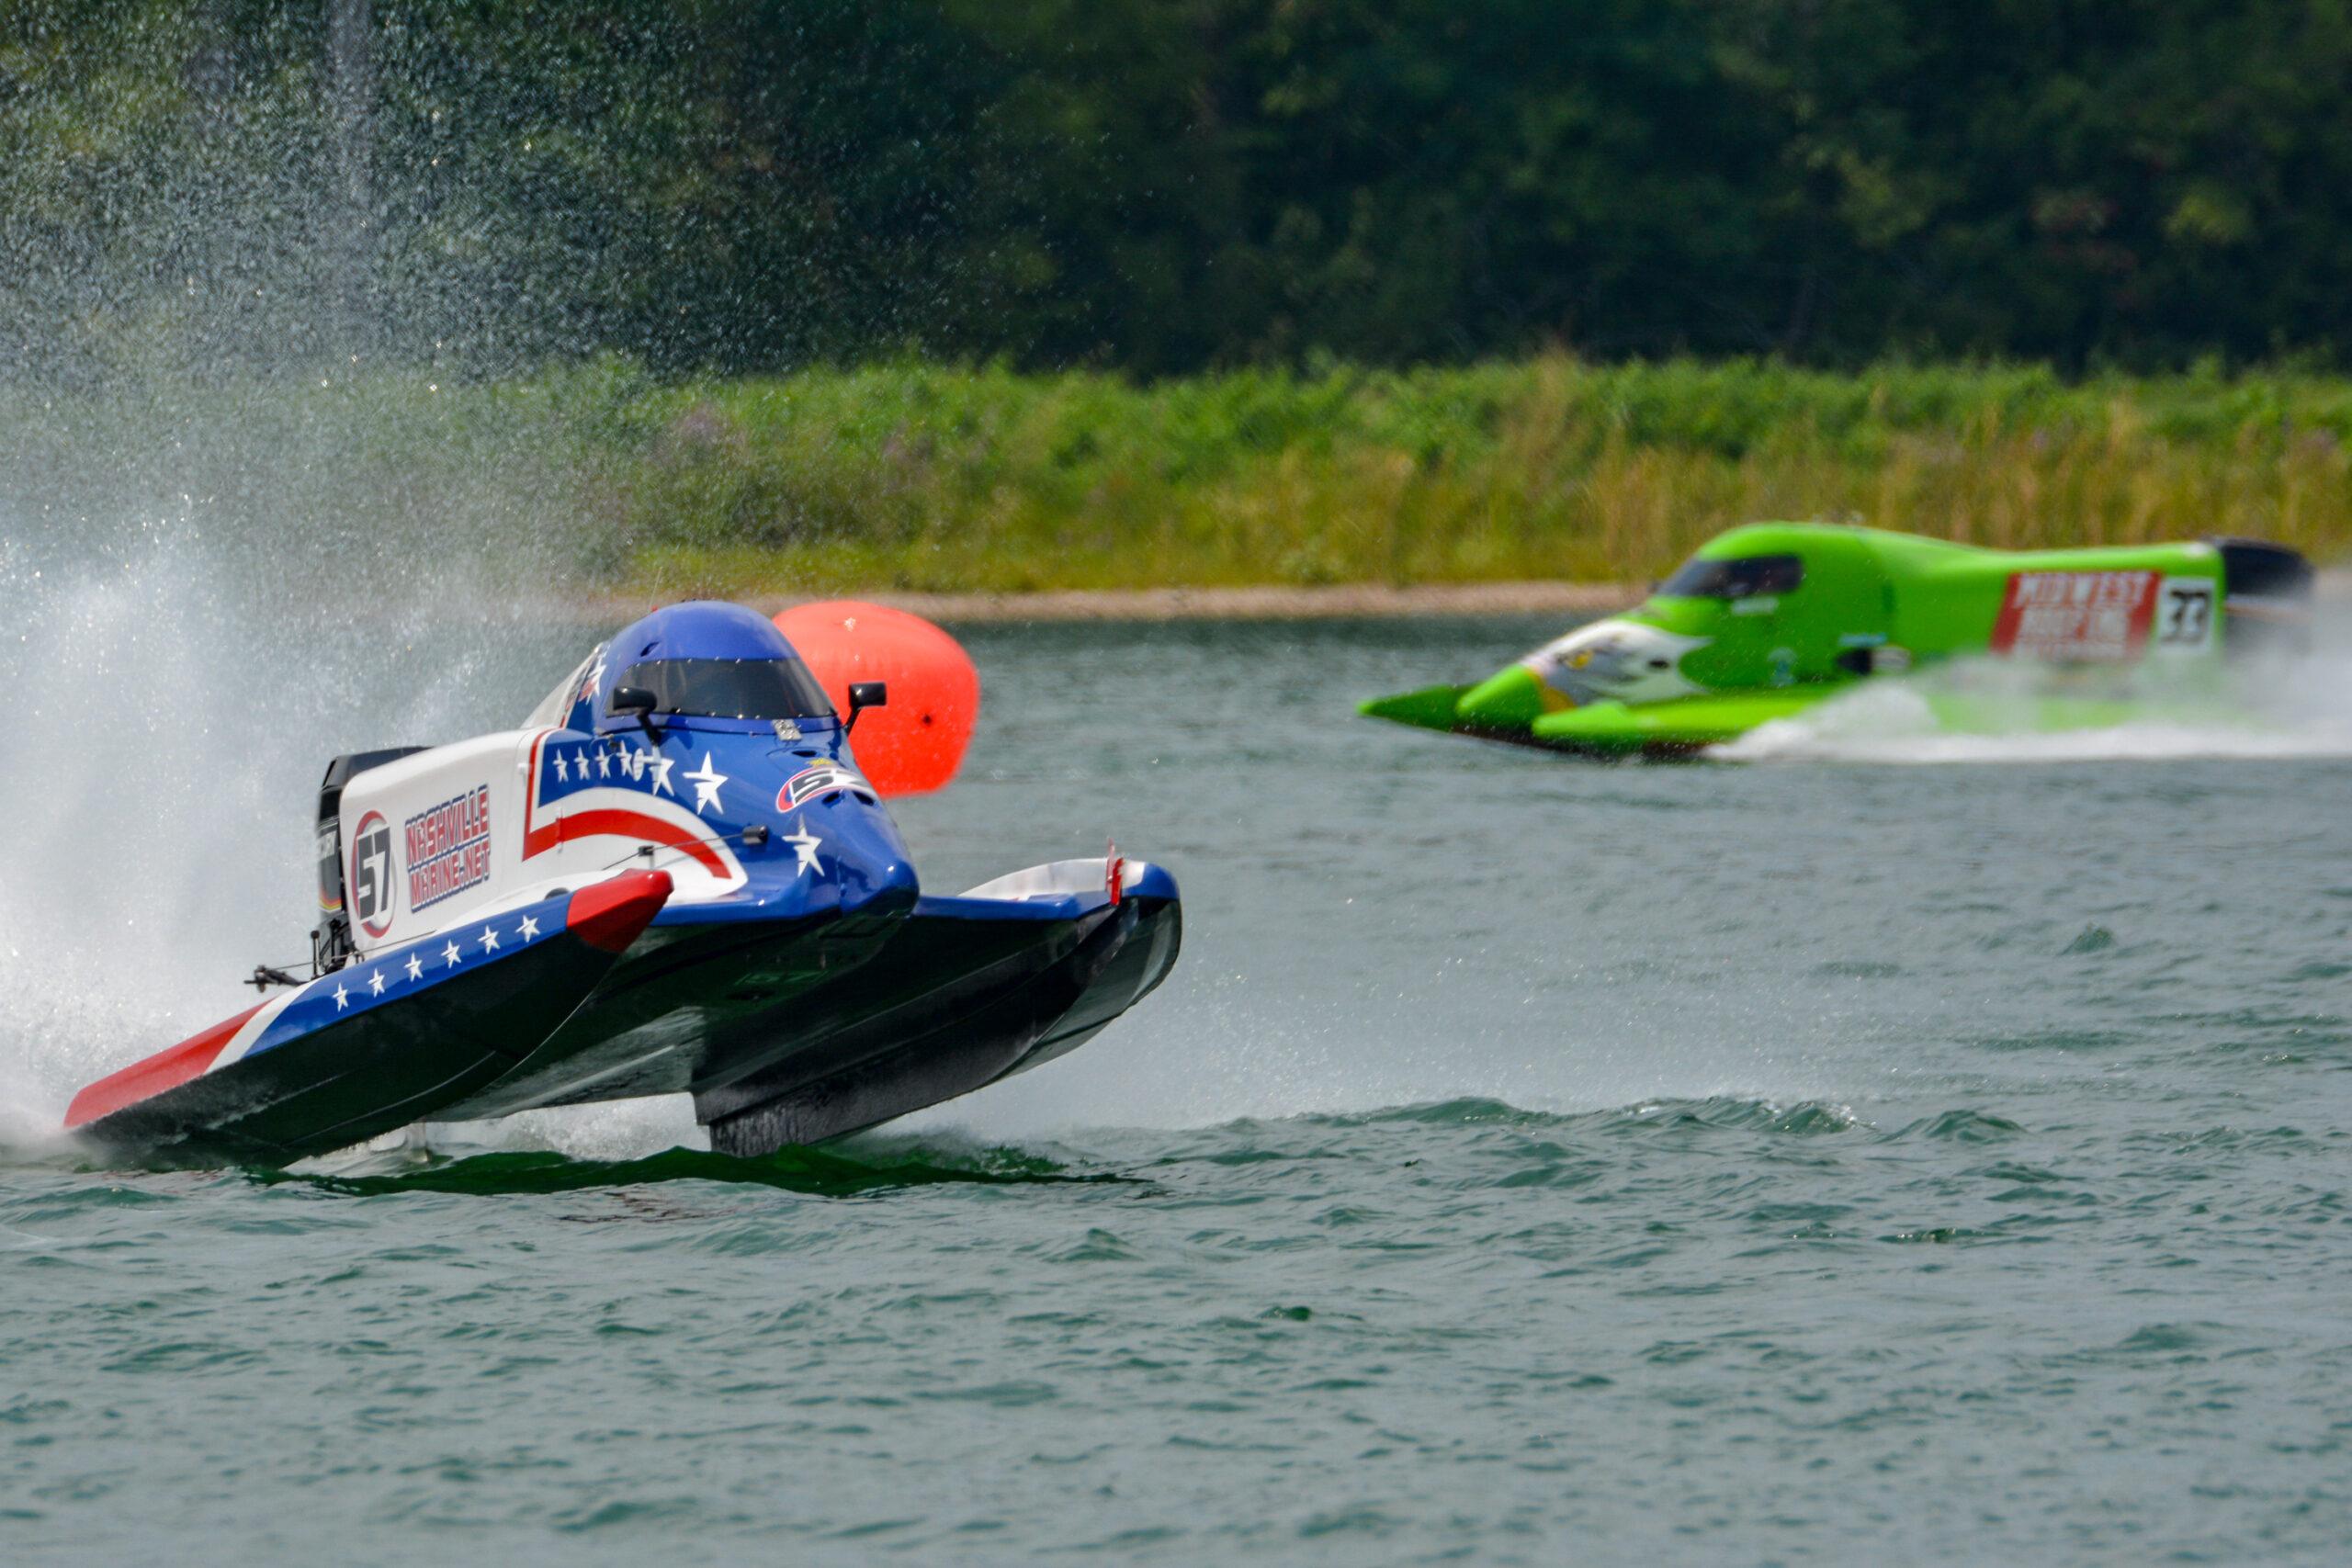 McMurray Racing Nashville Marine 2021 Springfield F1 Race-15